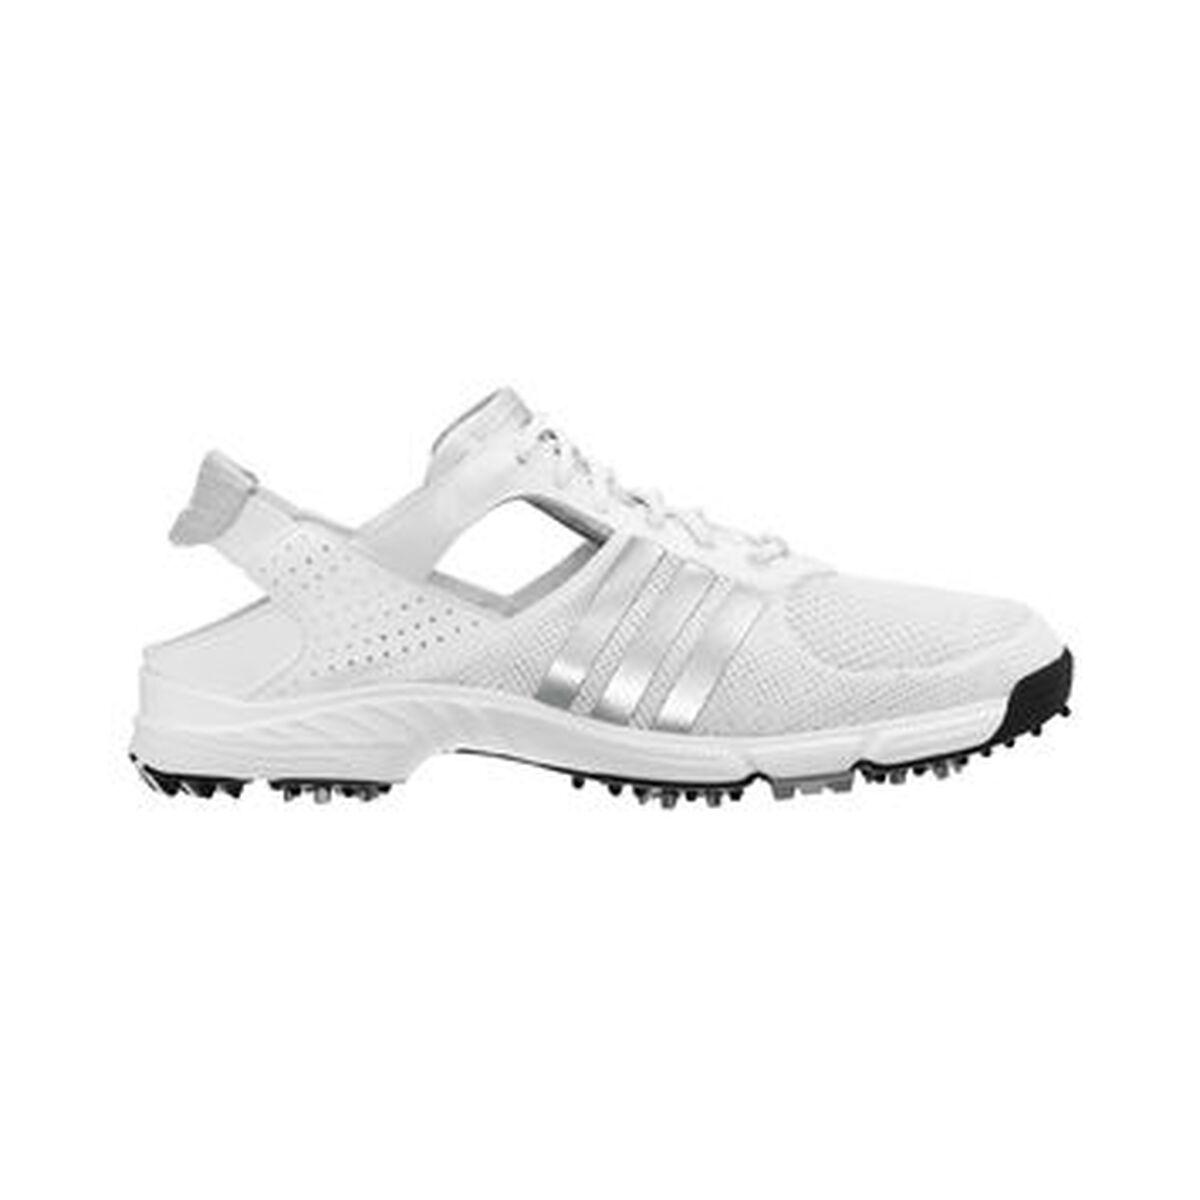 3f7bc06ee48 adidas ClimaCool Slingback Women s Golf Shoe  Shop Quality adidas ...